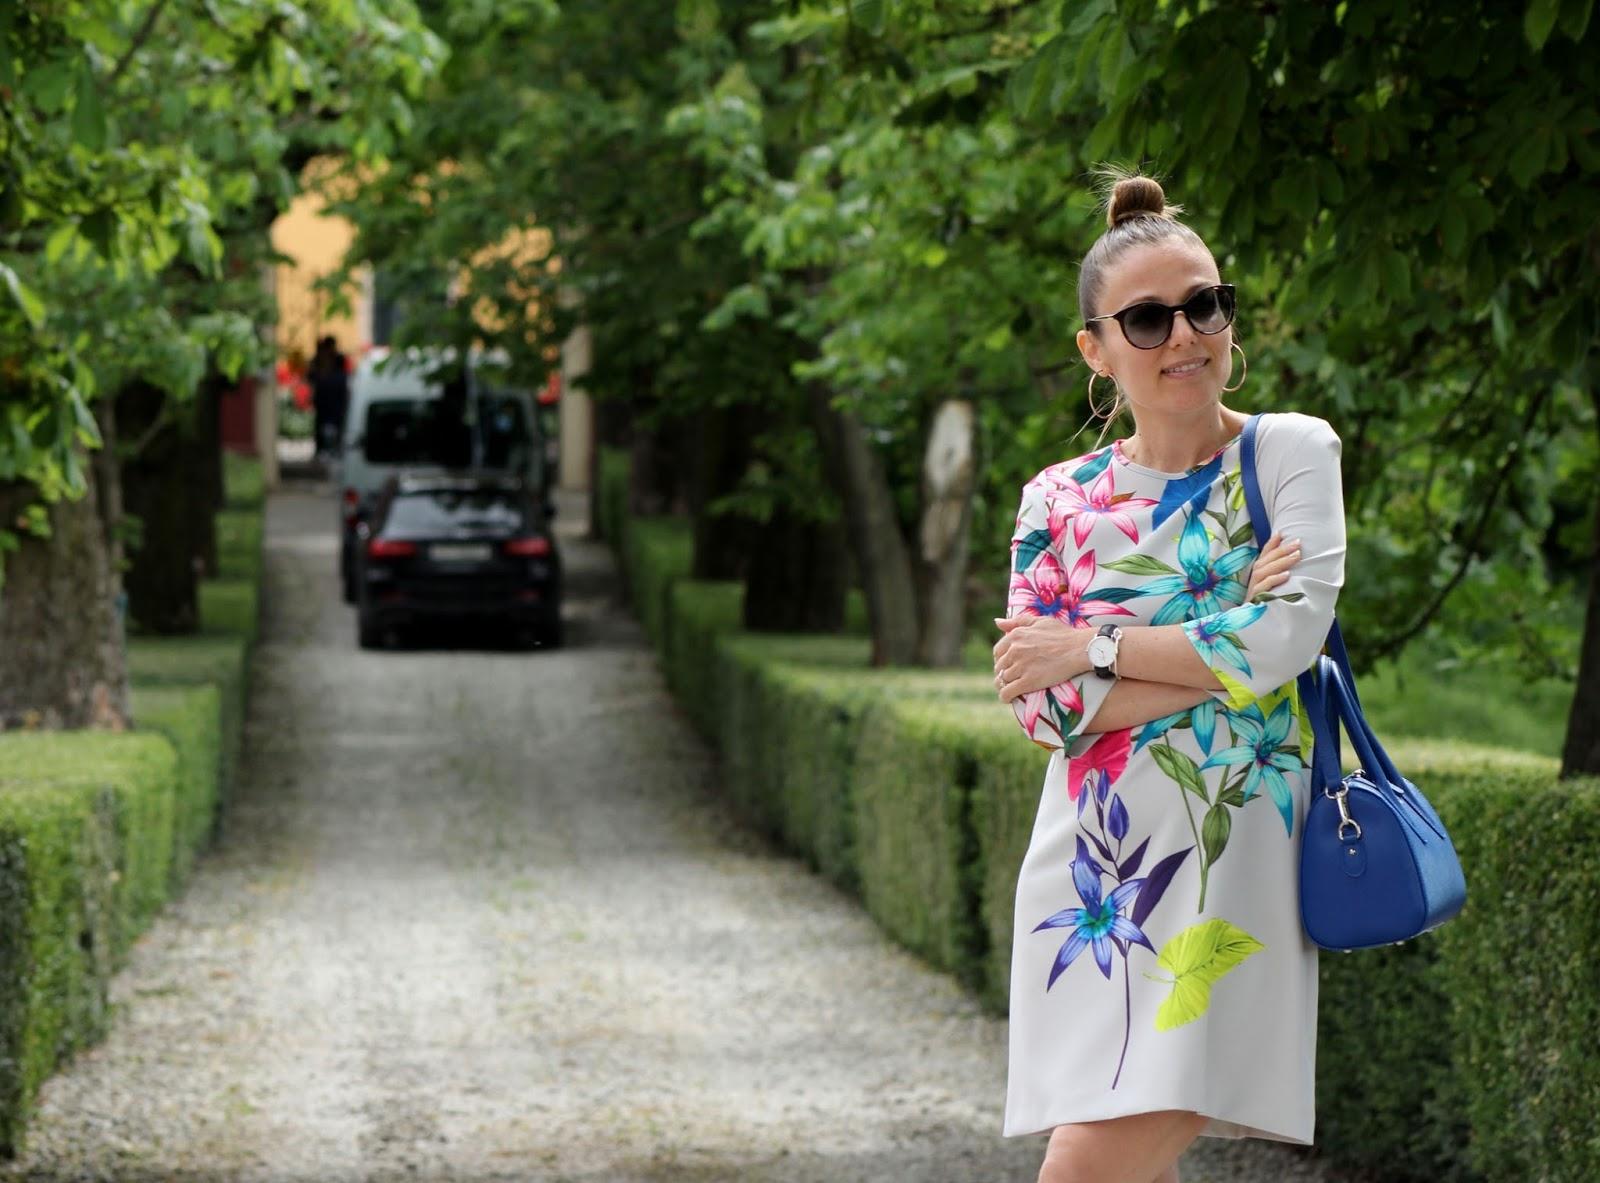 Come indossare un floral dress - Eniwhere Fashion - Imperial